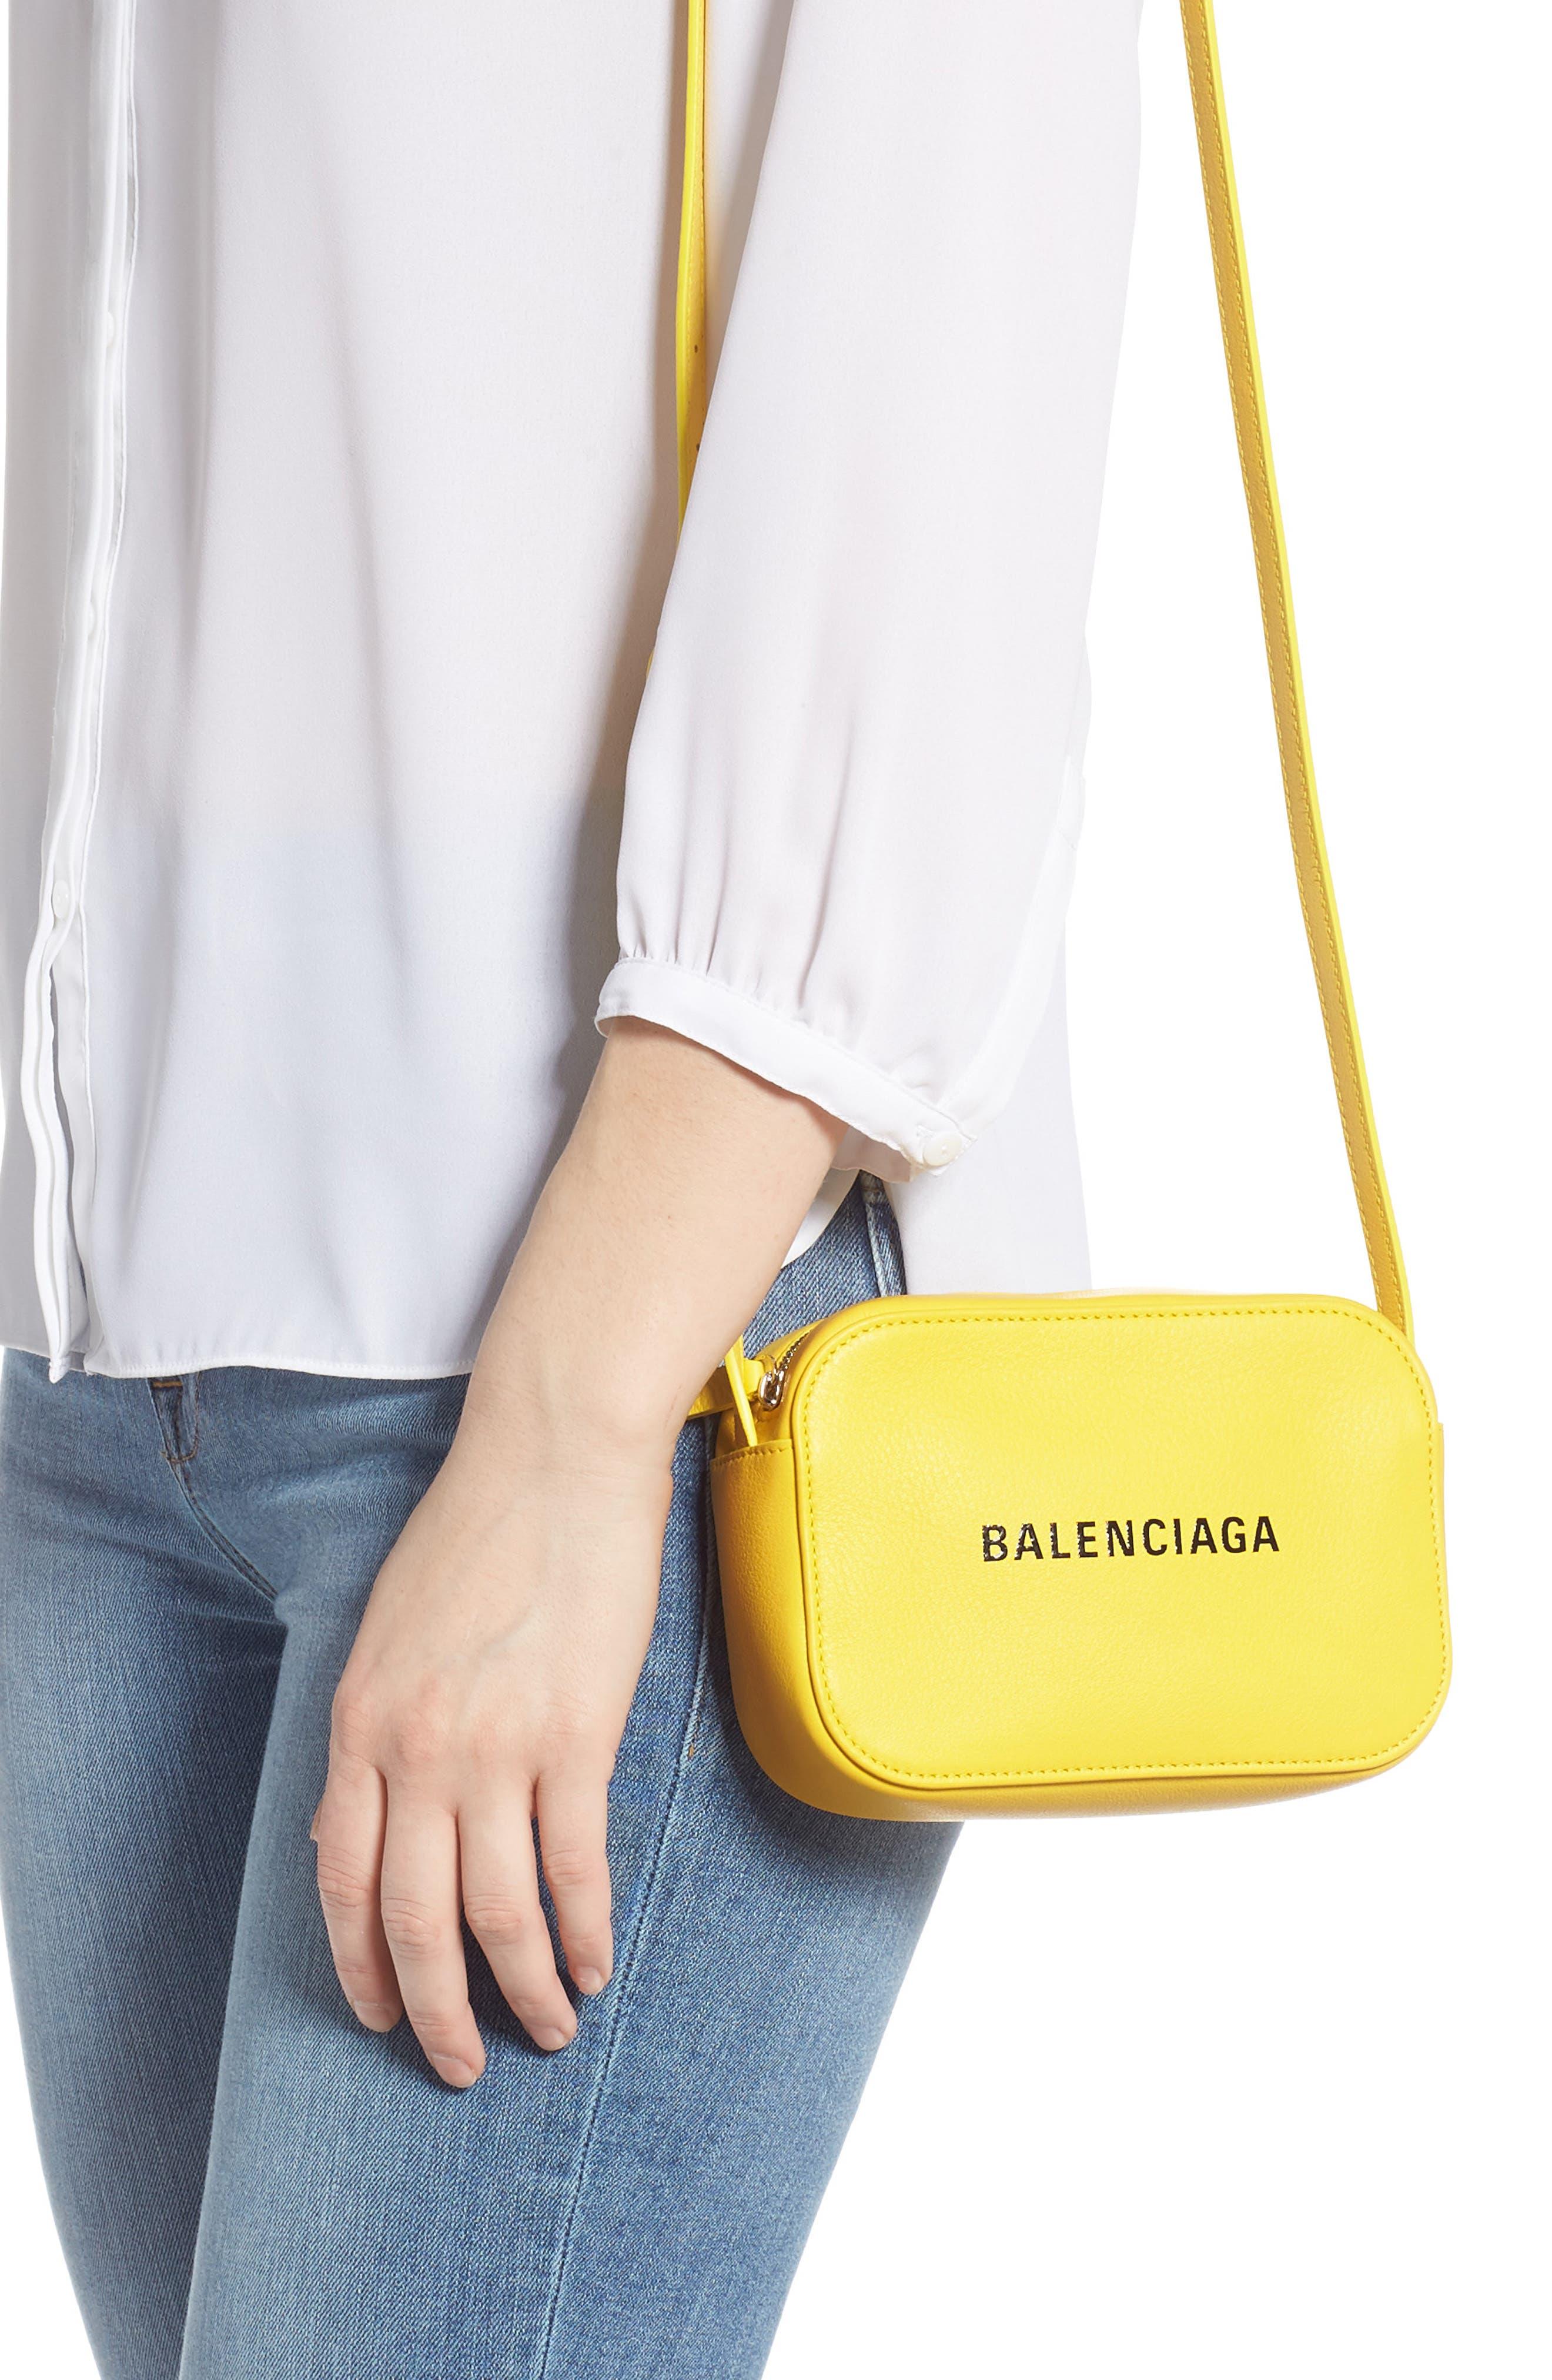 BALENCIAGA,                             Extra Small Everyday Calfskin Camera Bag,                             Alternate thumbnail 2, color,                             JAUNE SOLEIL/ NOIR